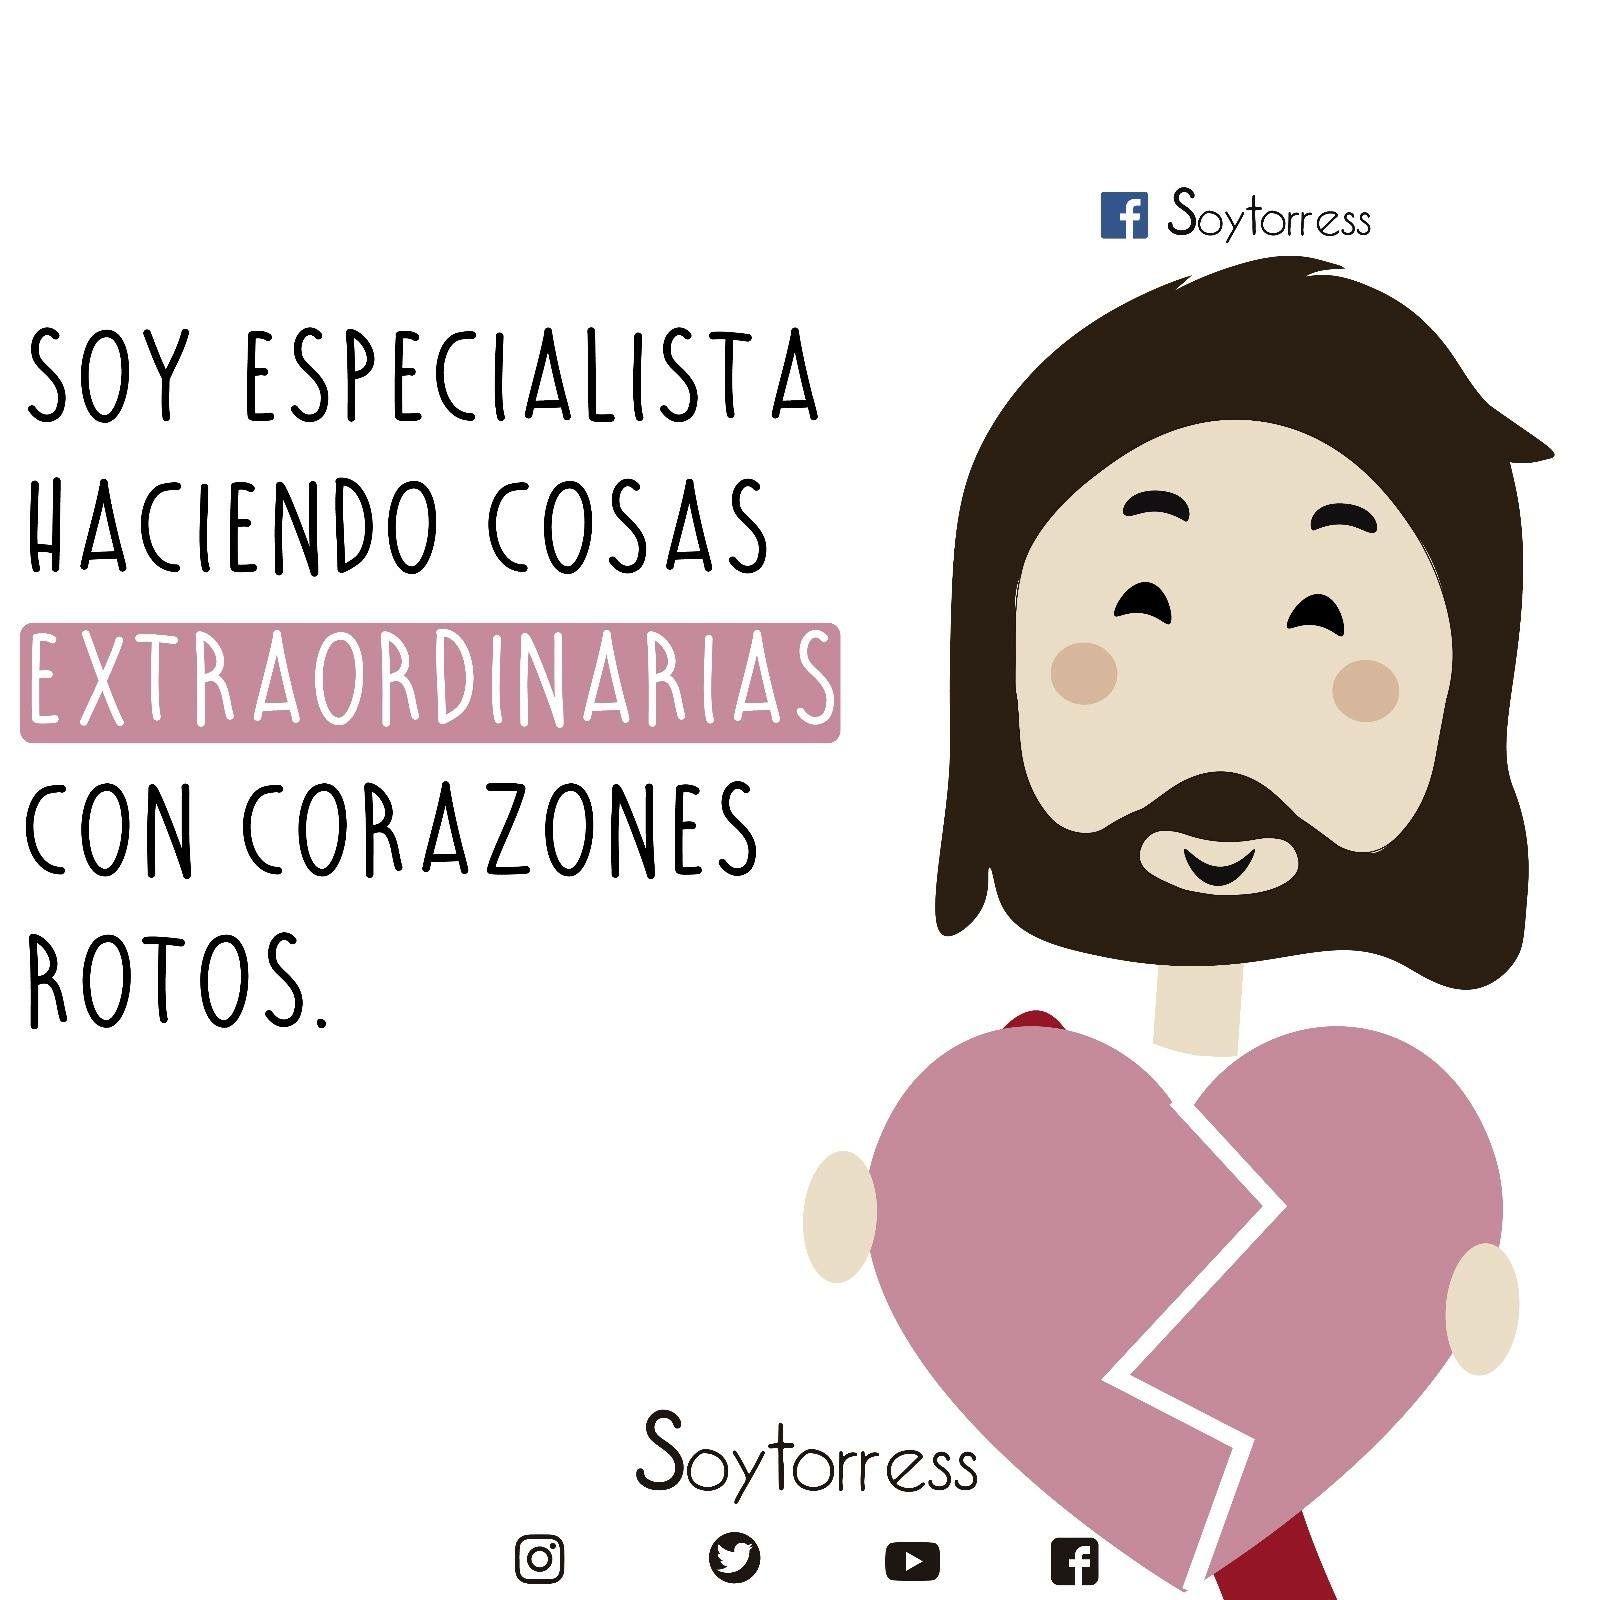 Tú Señor eres el restaurador! | Frases | Pinterest | Señor ...